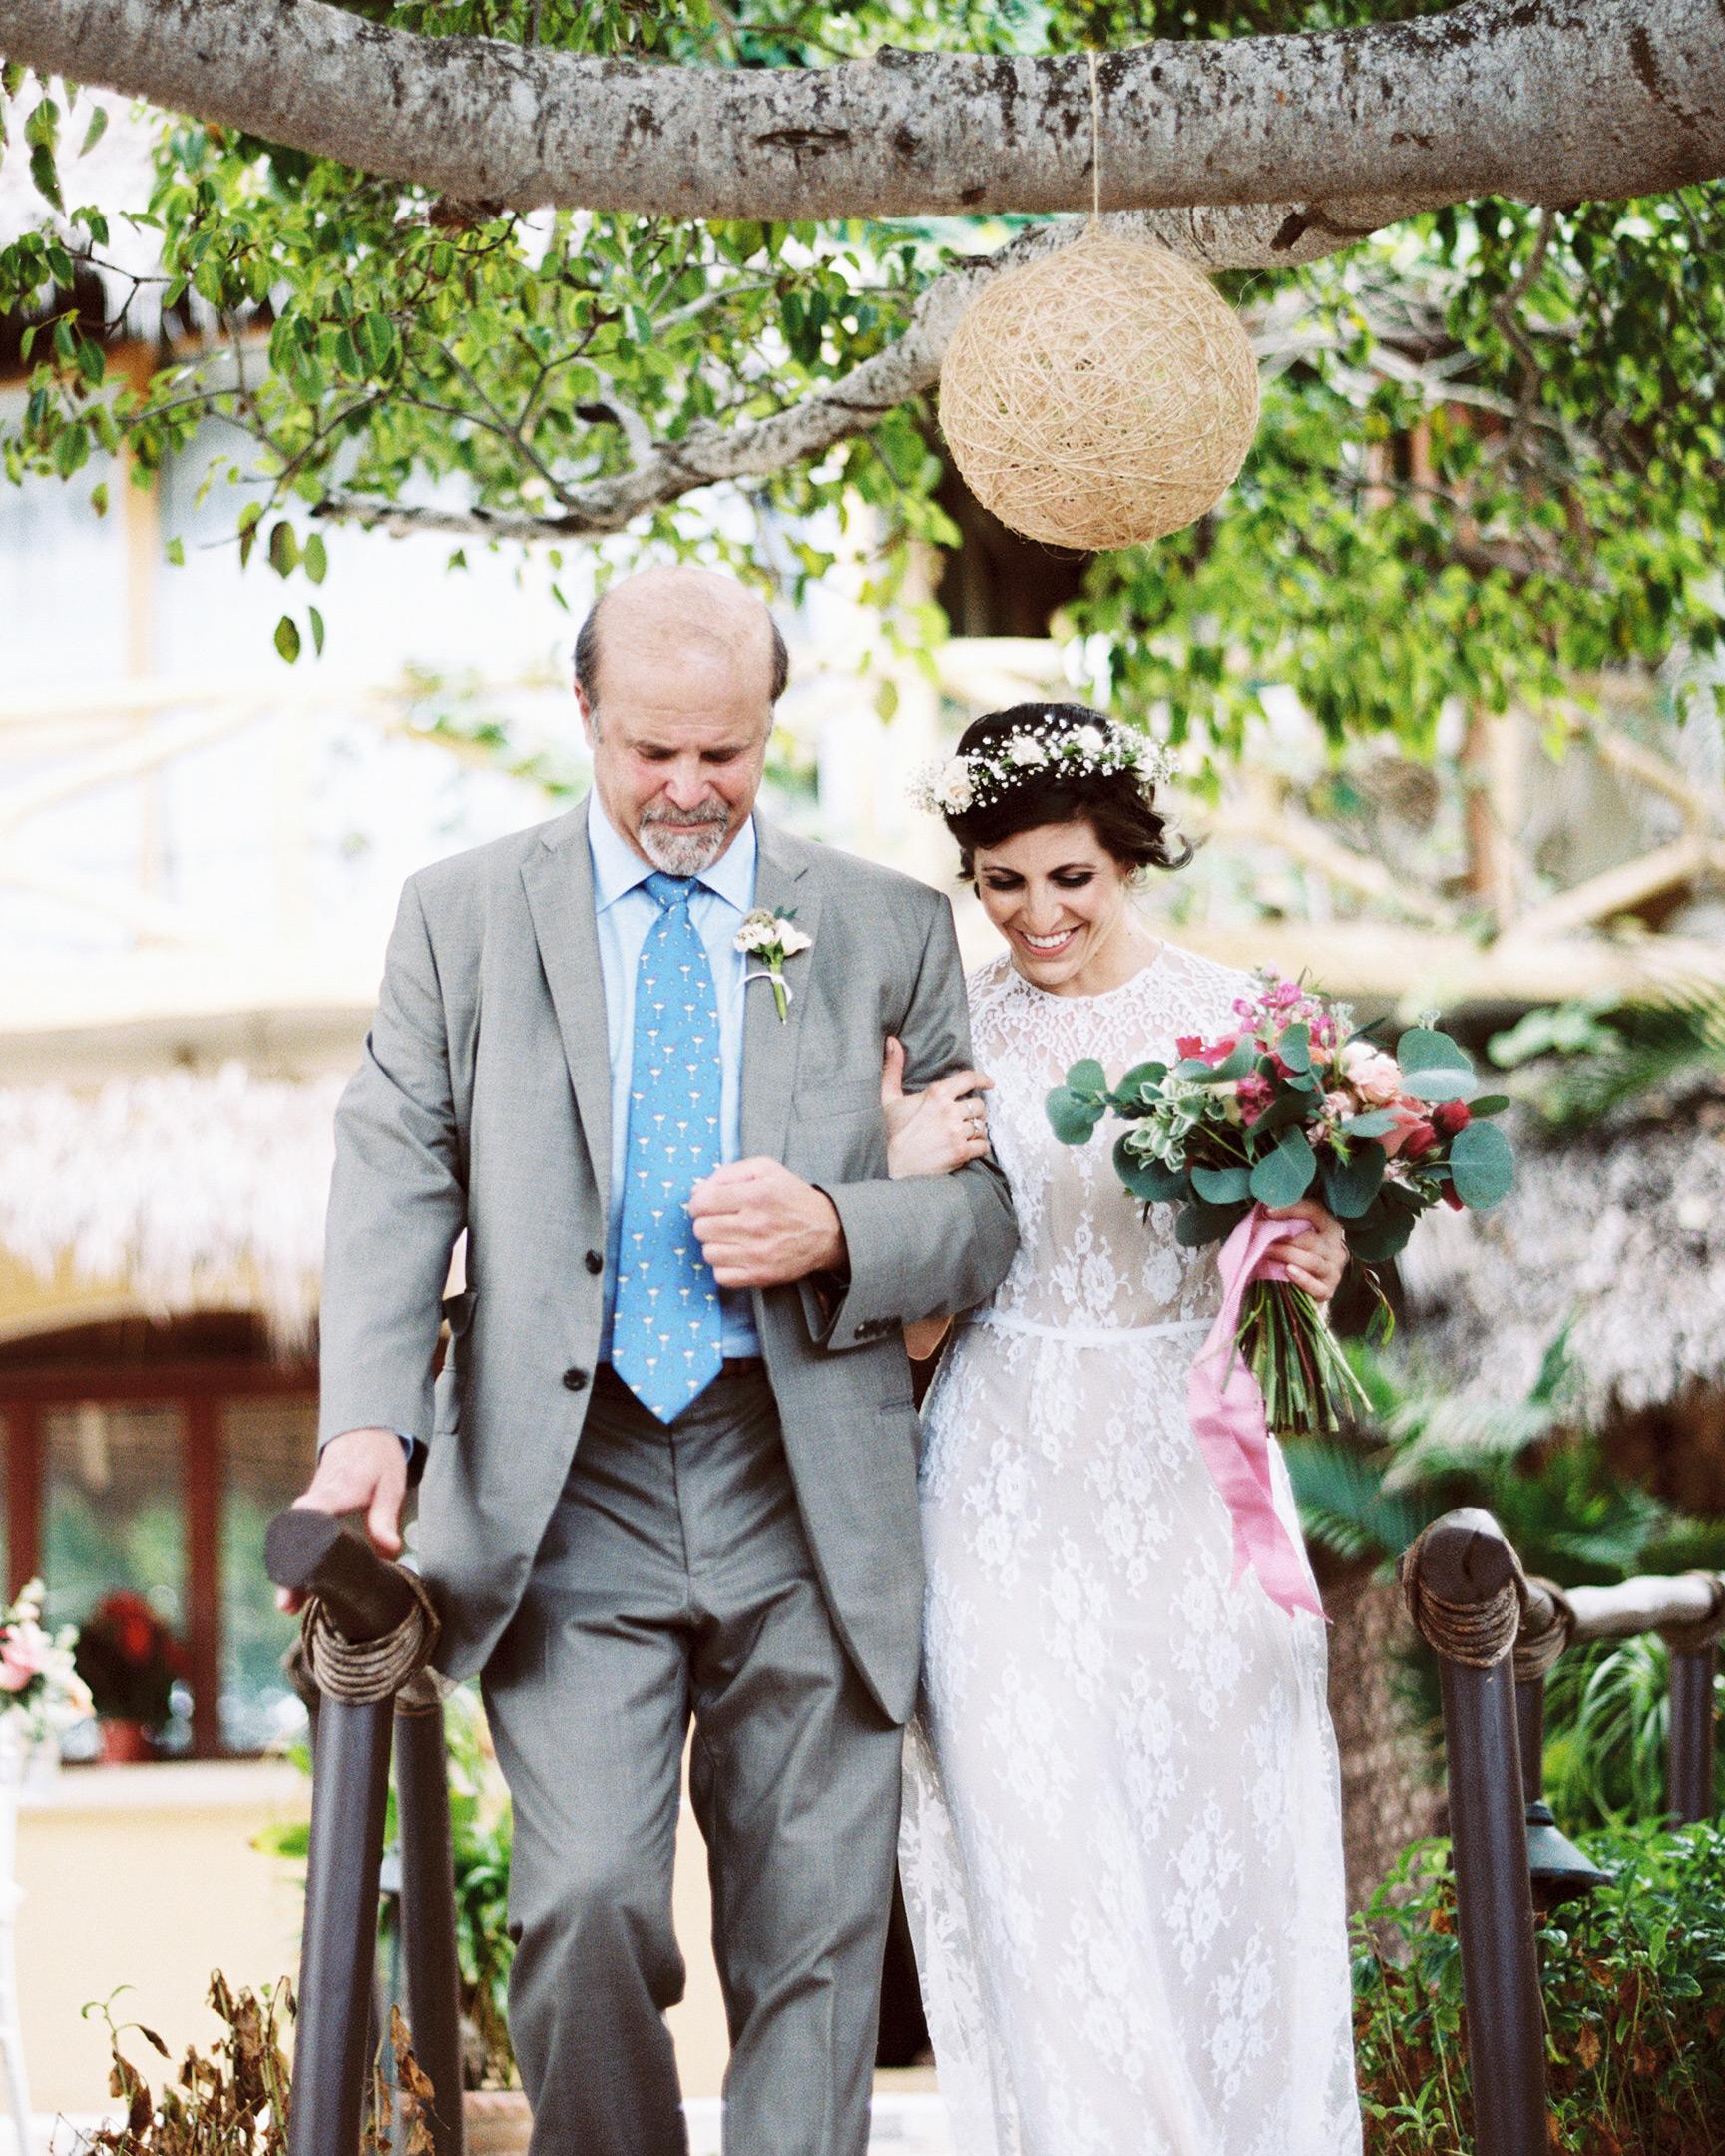 rebecca-eji-wedding-processional-374-s113057-0616.jpg